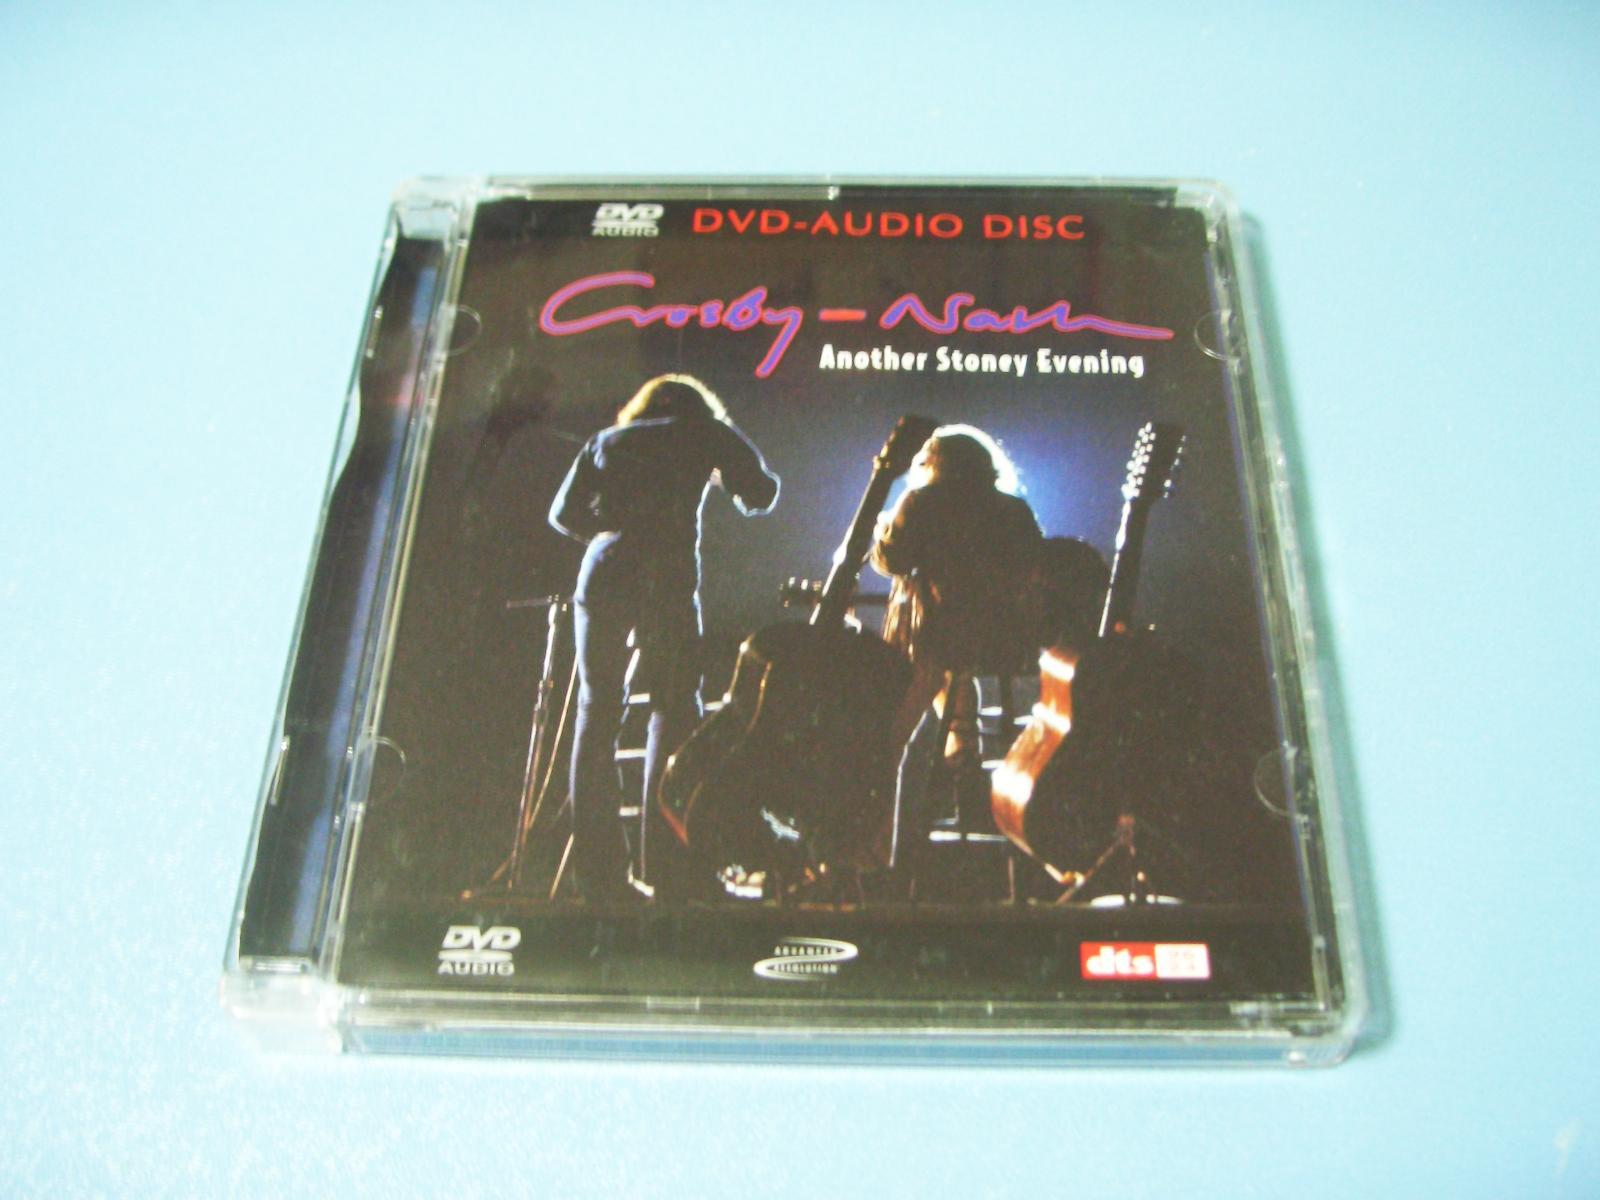 Crosby & Nash / Another Stoney Evening(DVD-AUDIO)_c0062649_22371672.jpg